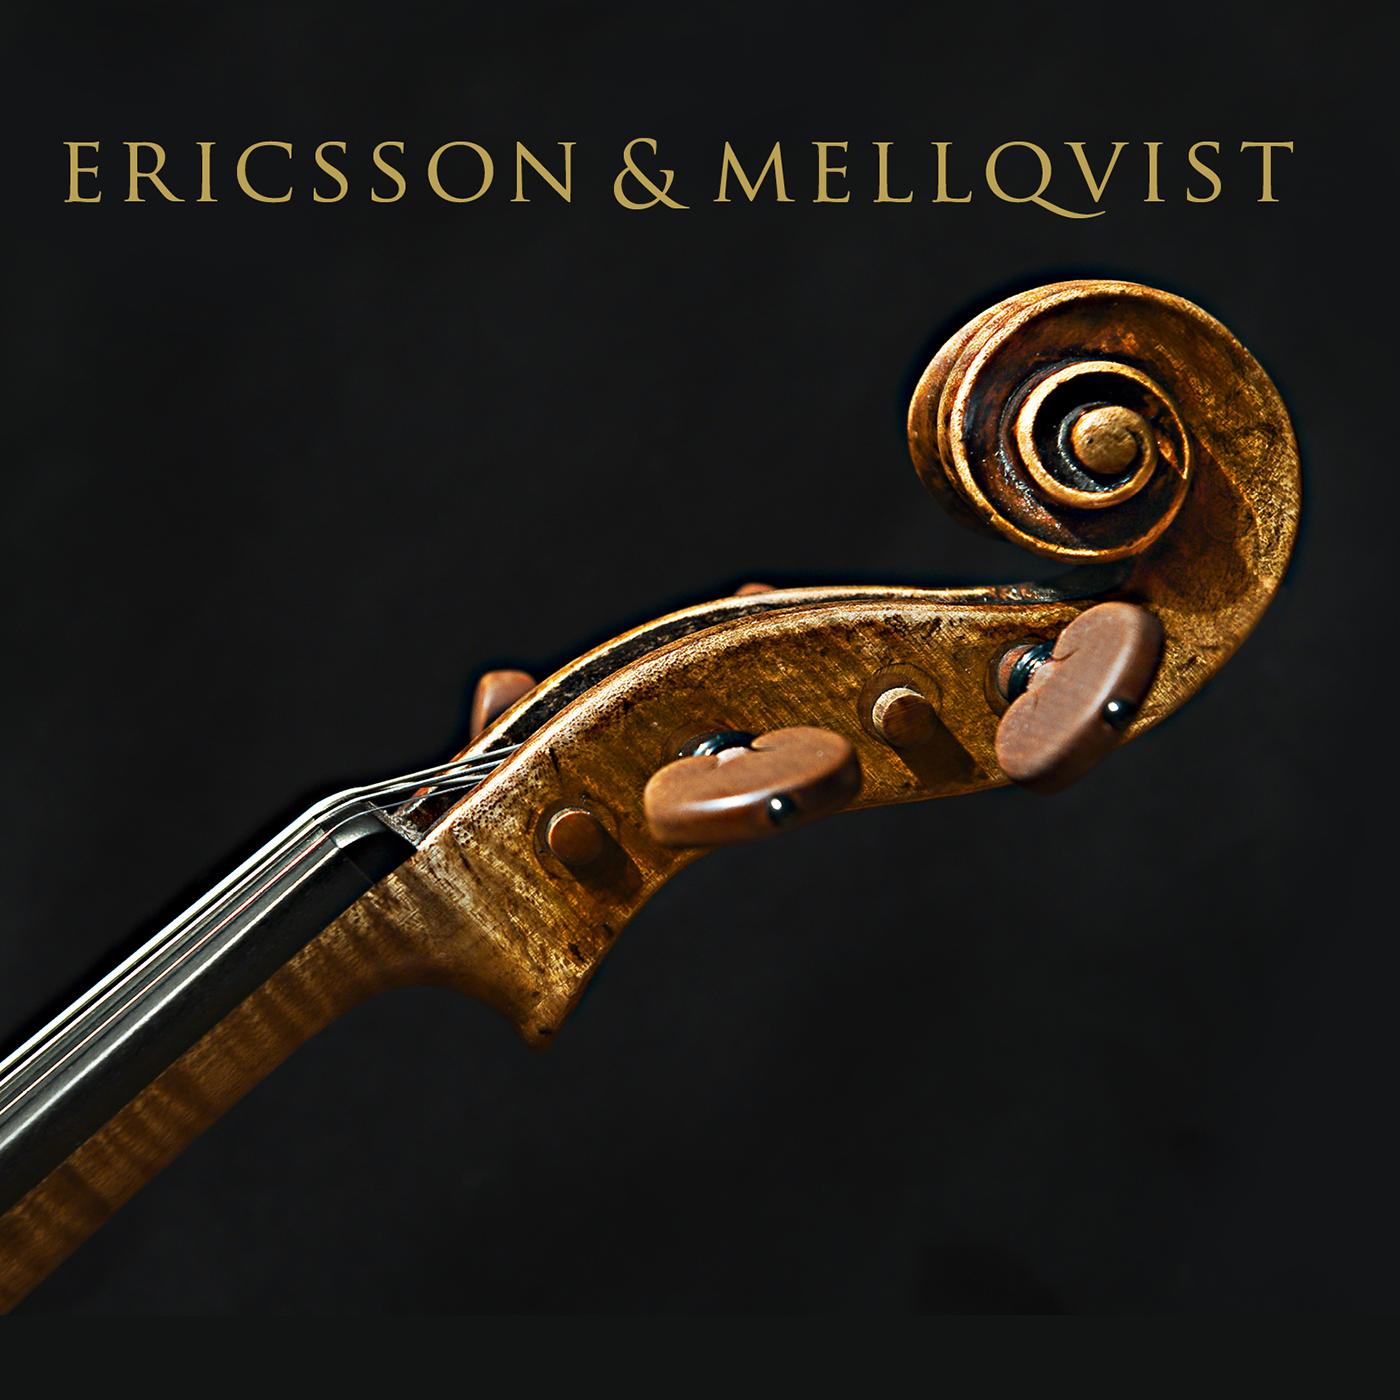 On Spotify : Ericsson & Mellqvist